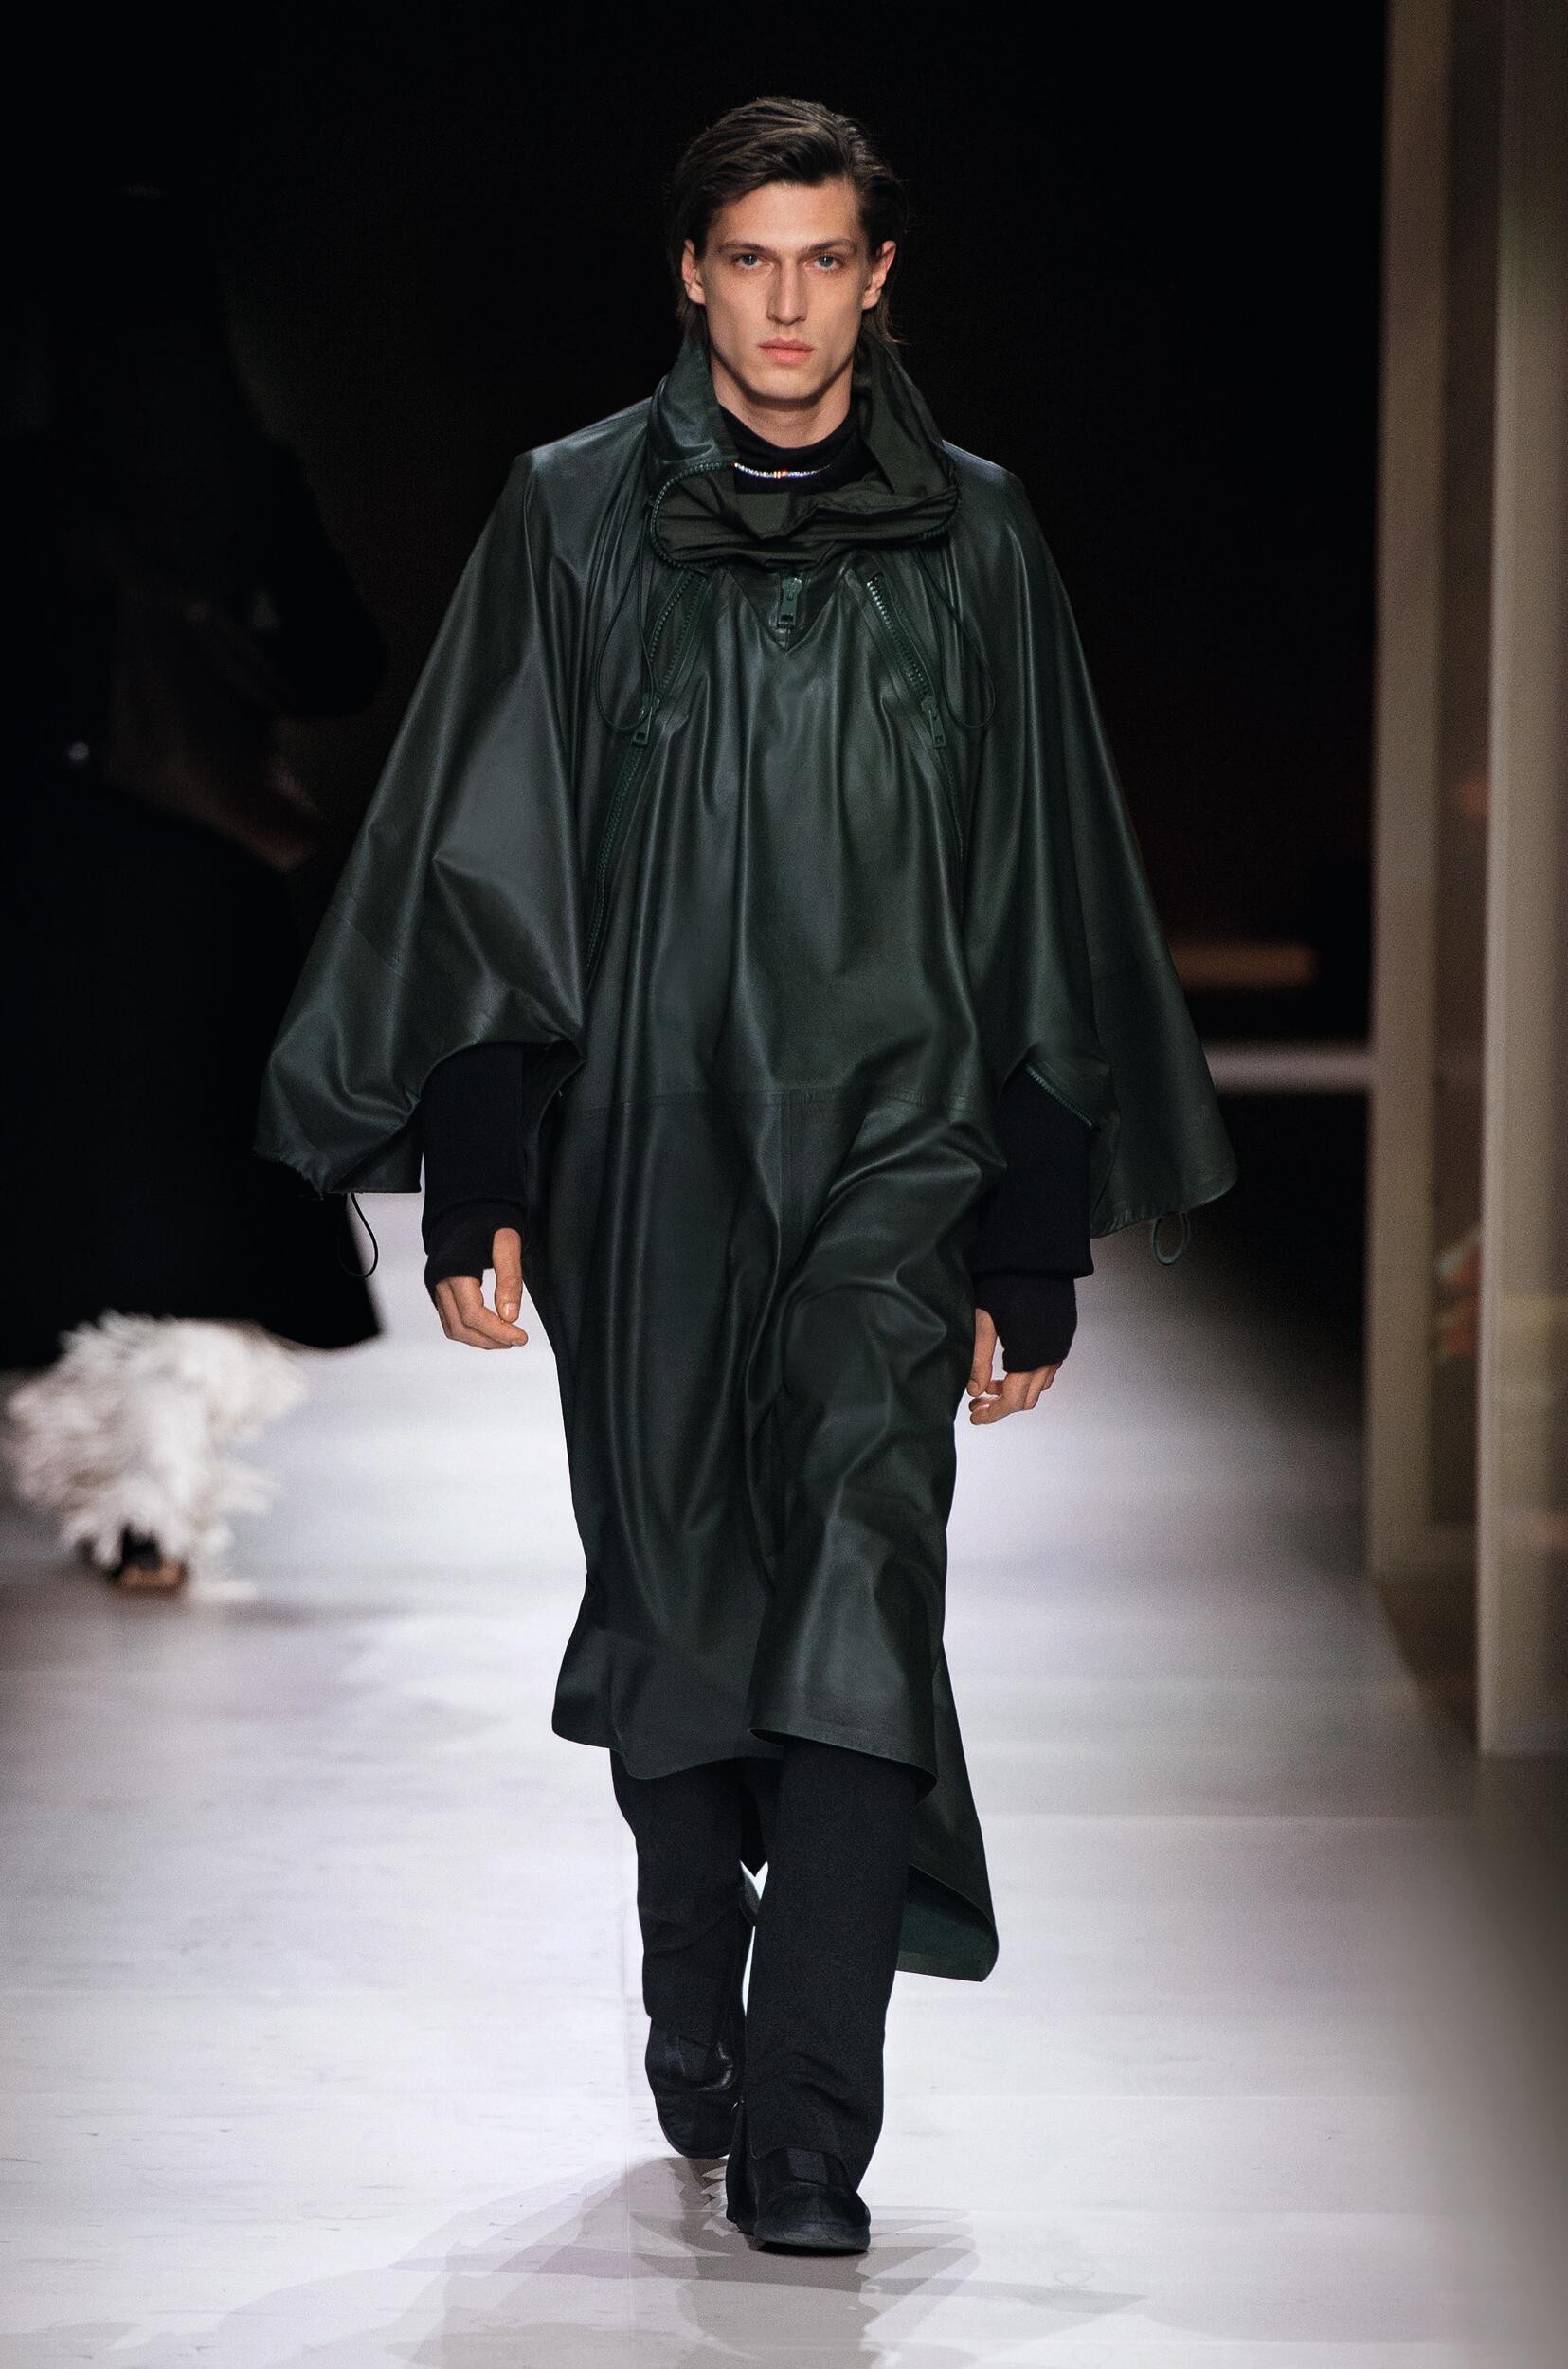 Catwalk Bottega Veneta Man Fashion Show Winter 2020